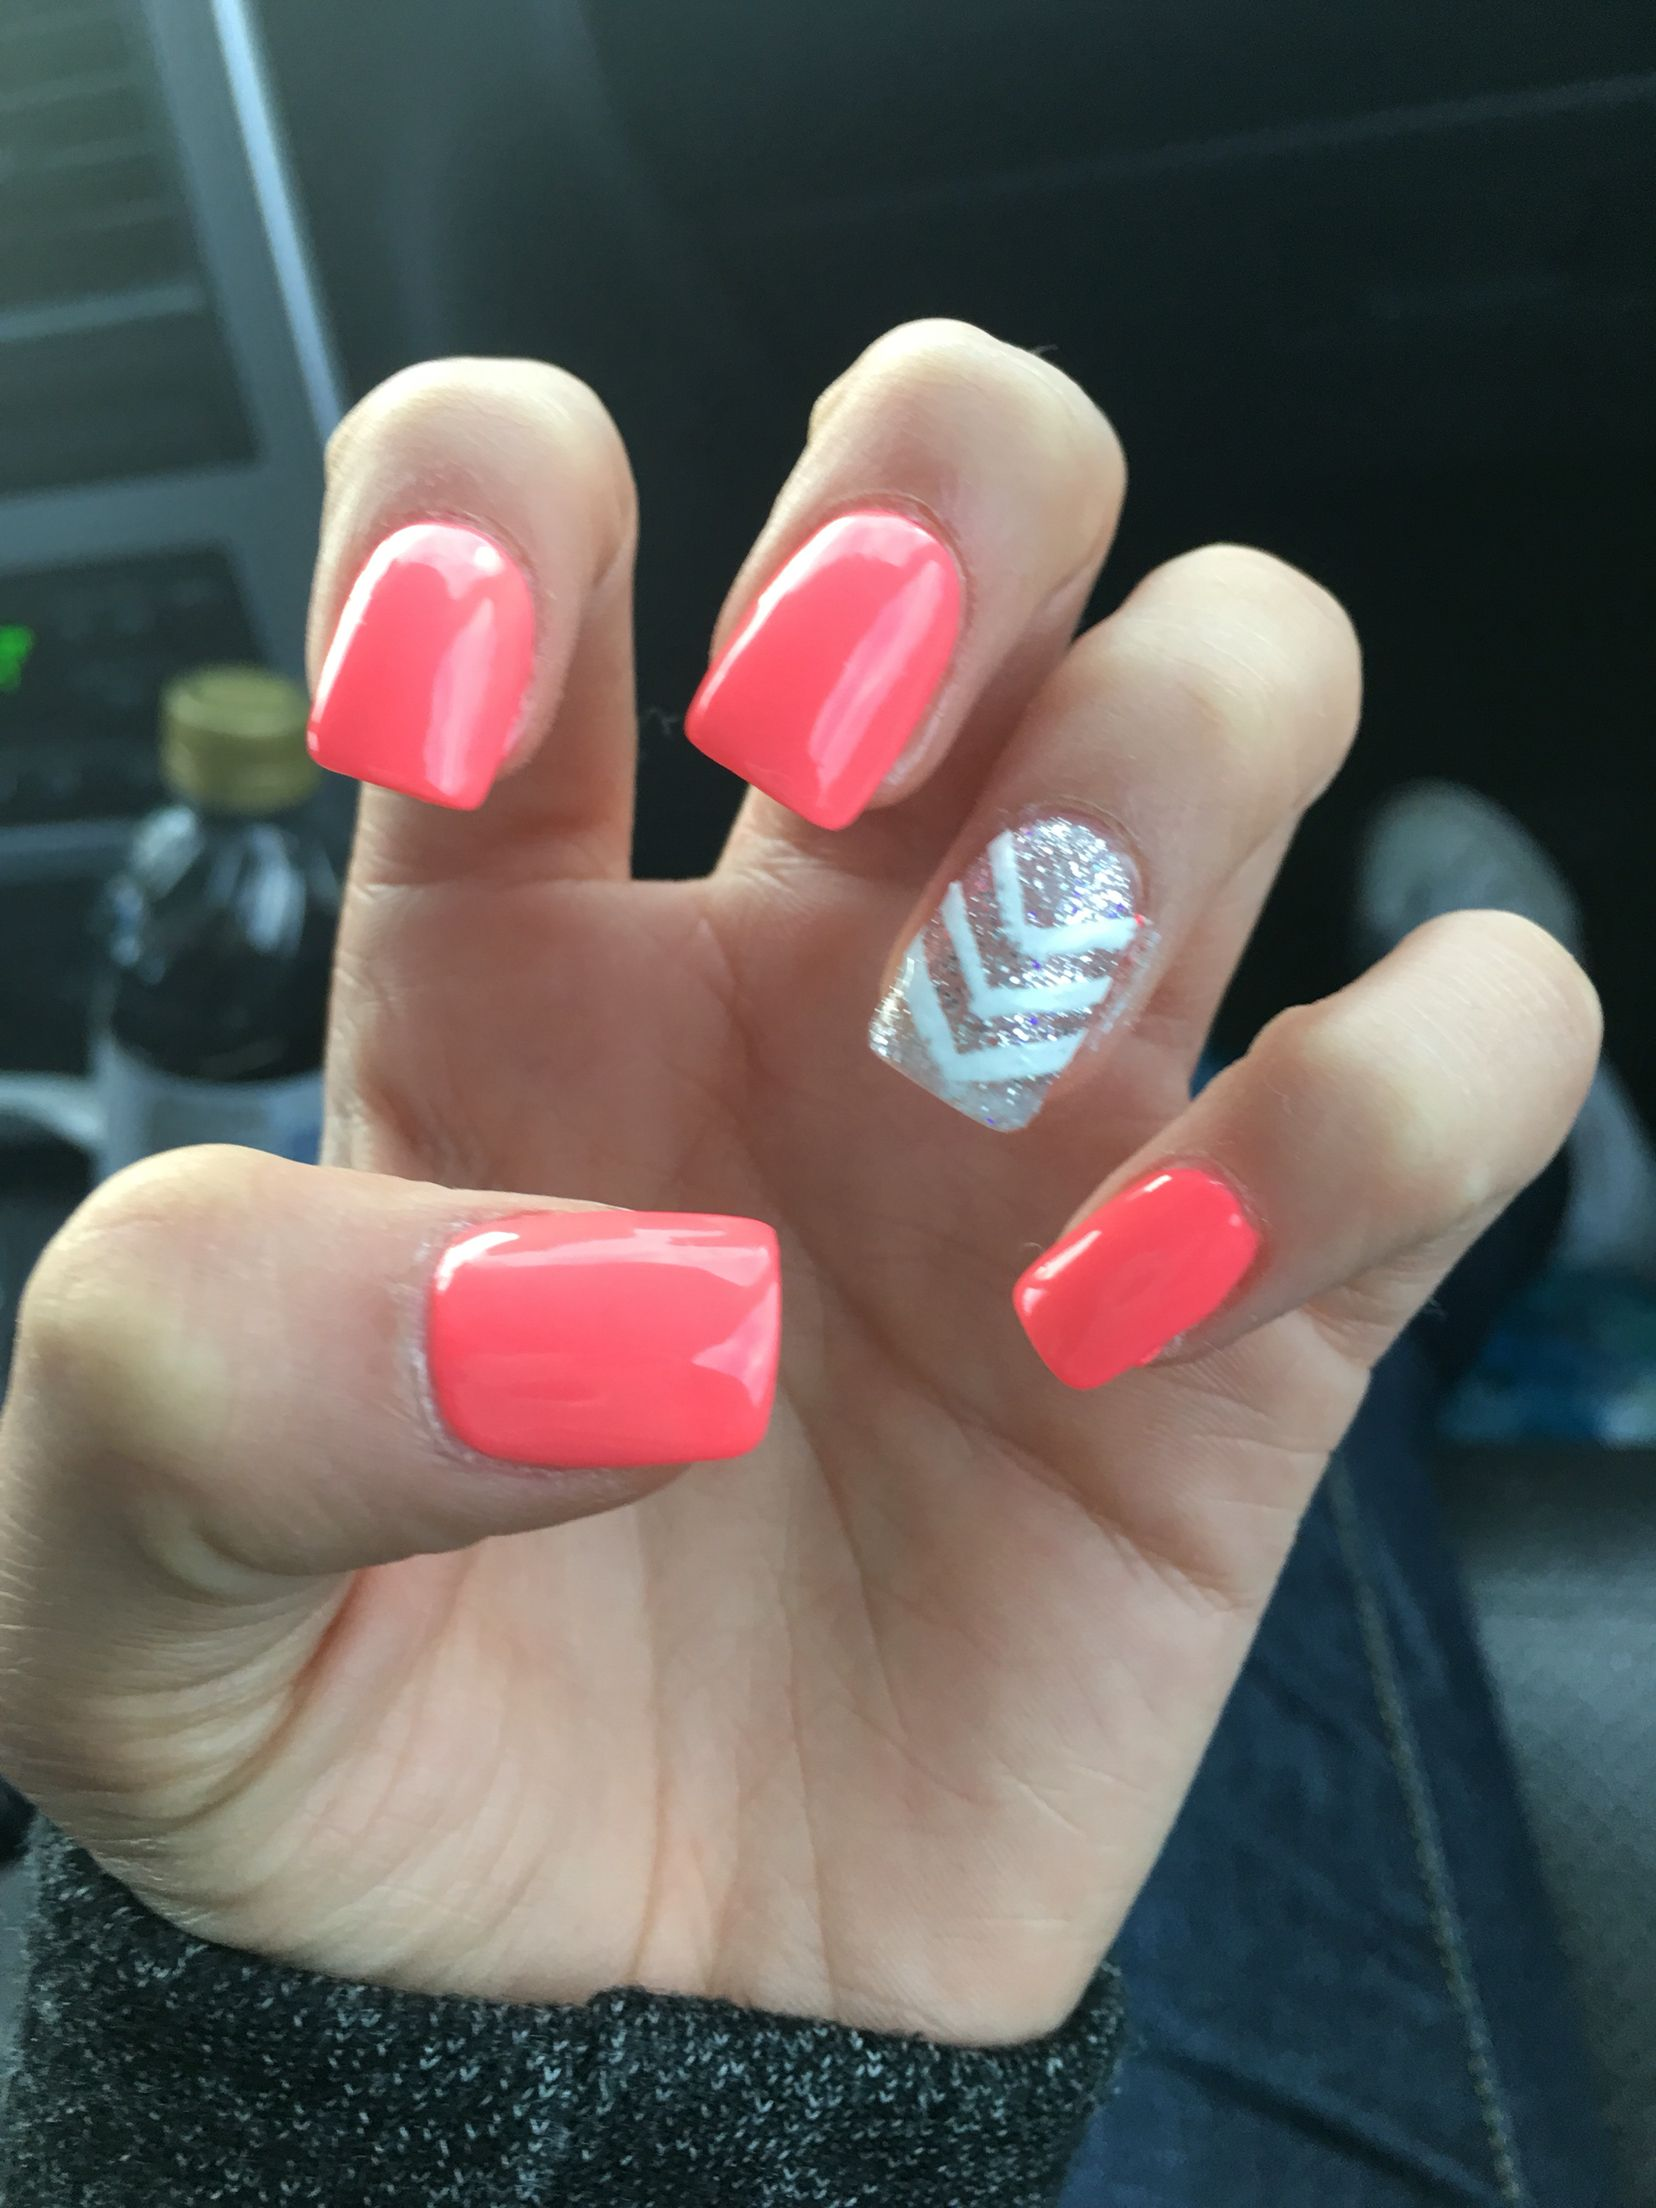 I love my Pink acrylic nails | Nails | Pinterest | Pink acrylic ...